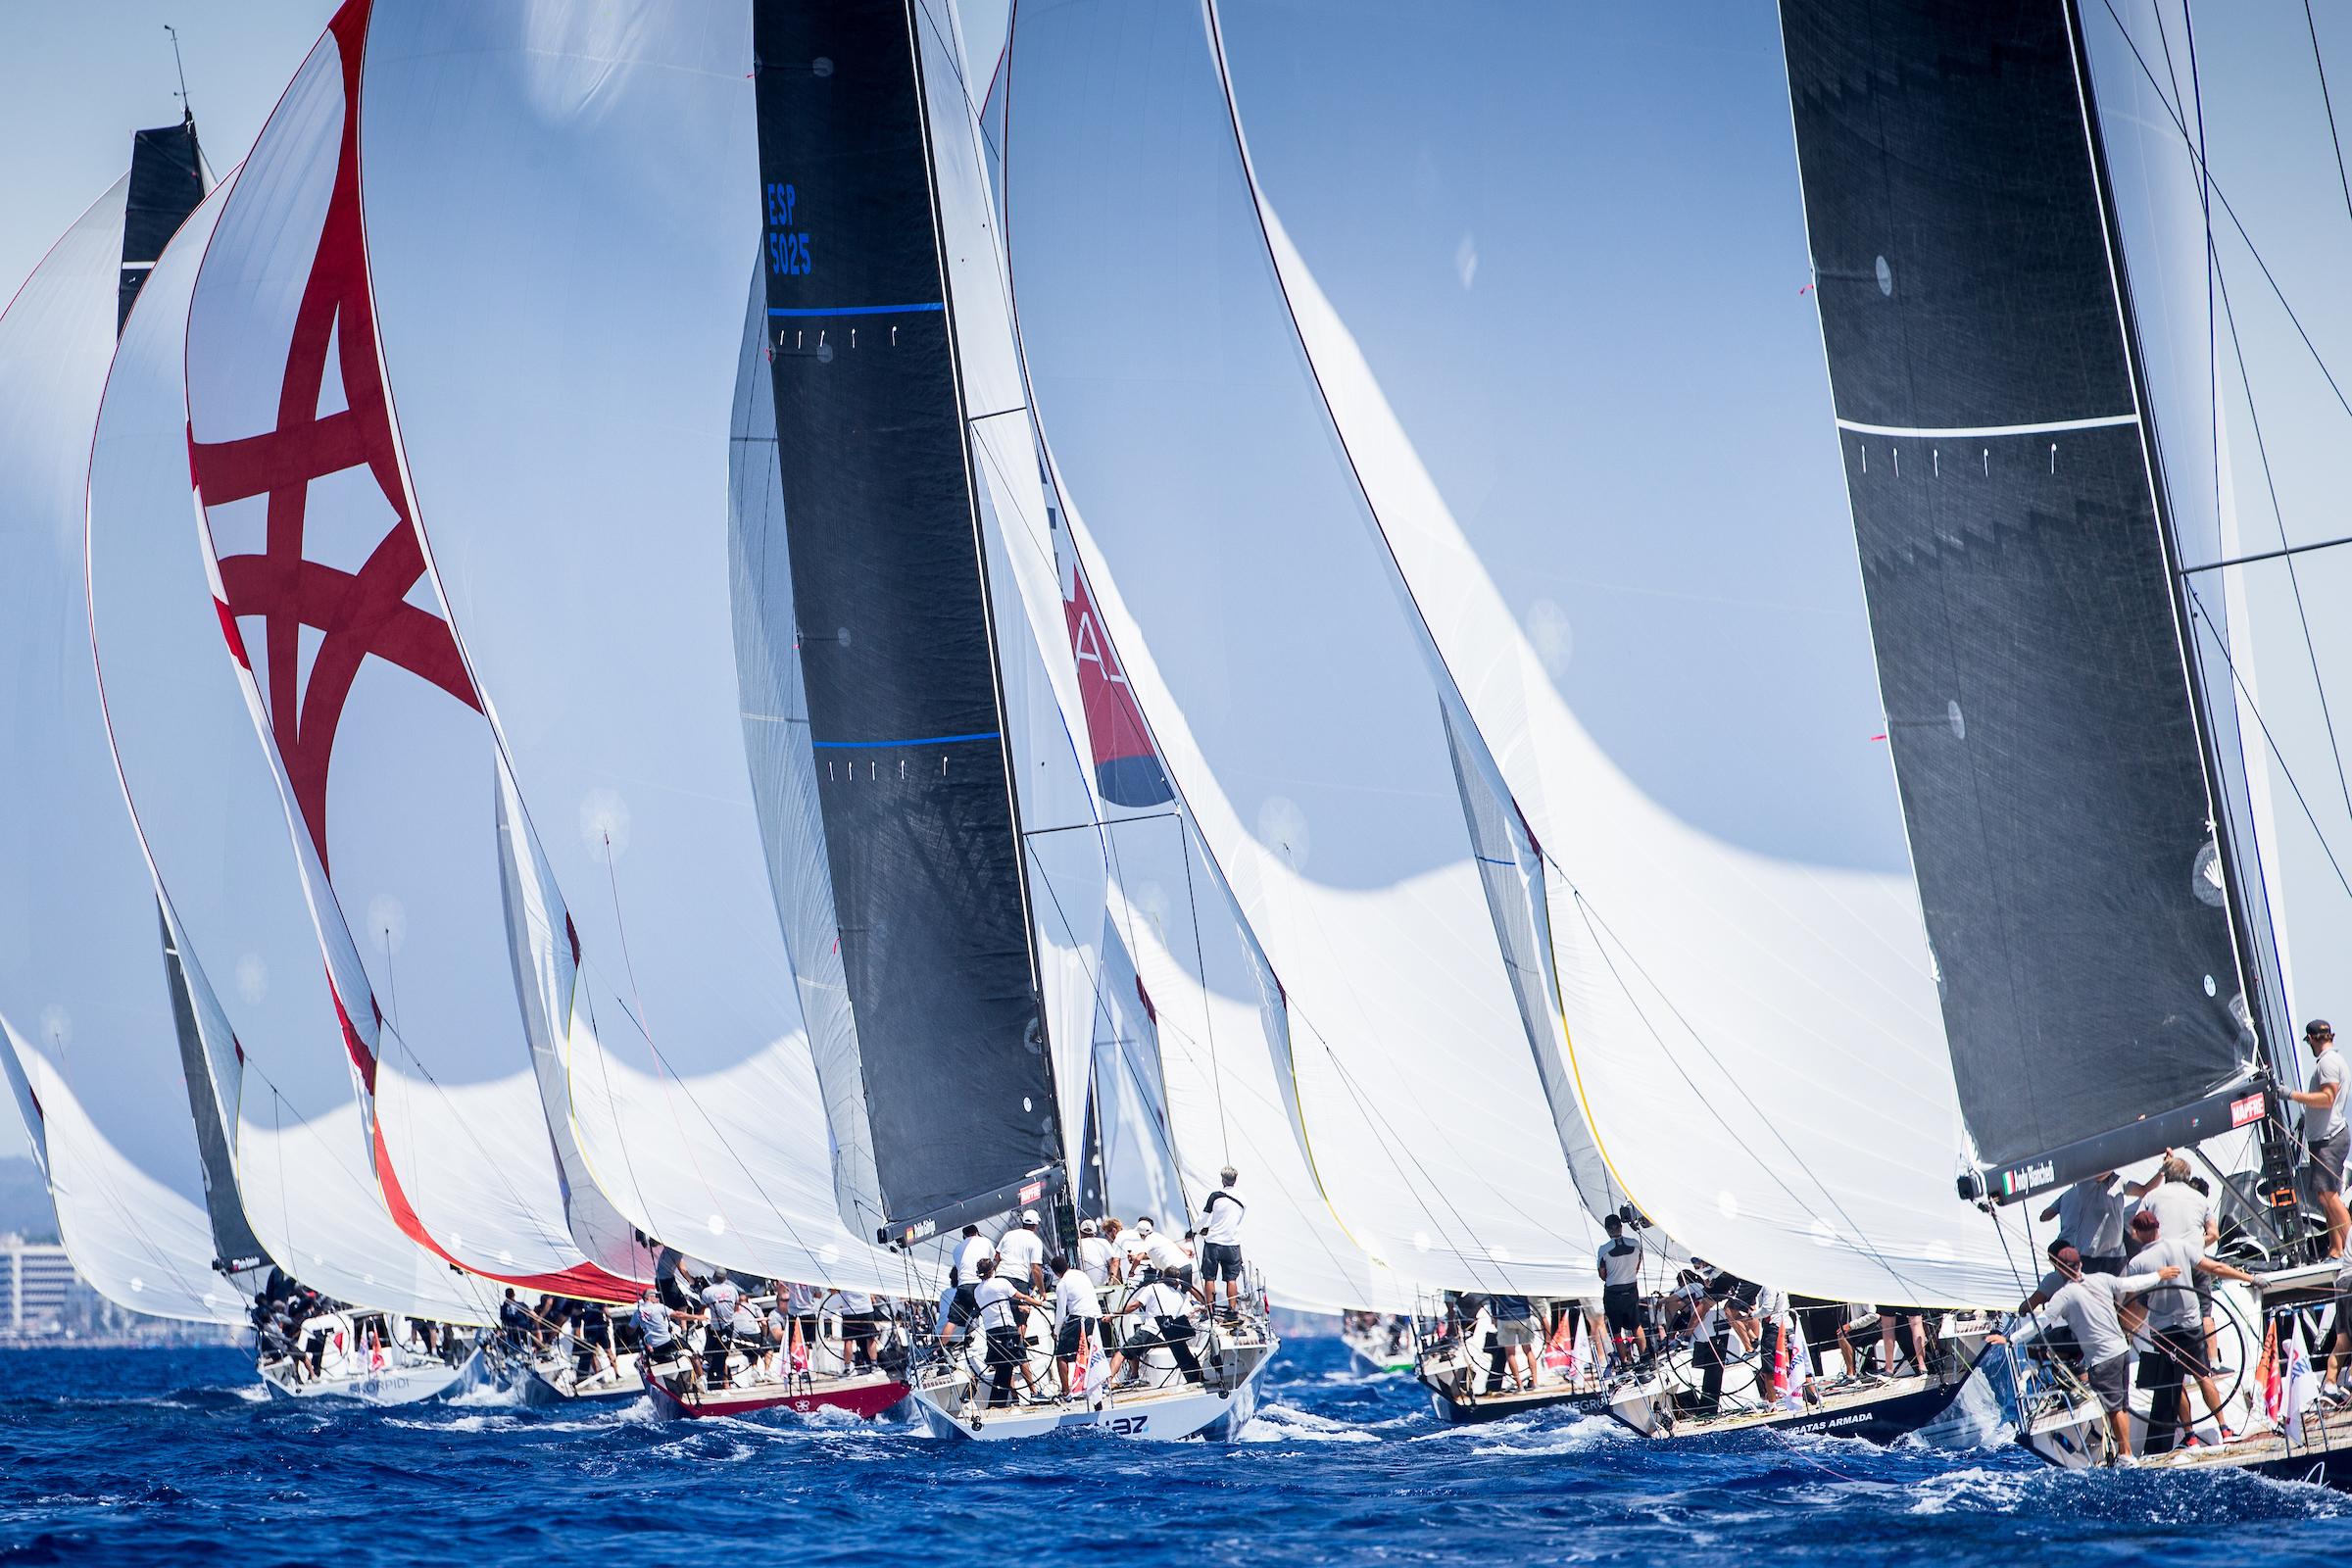 Clubswan-50-fleet-on-the-Bay-of-Palma---Maria-Muina-pic